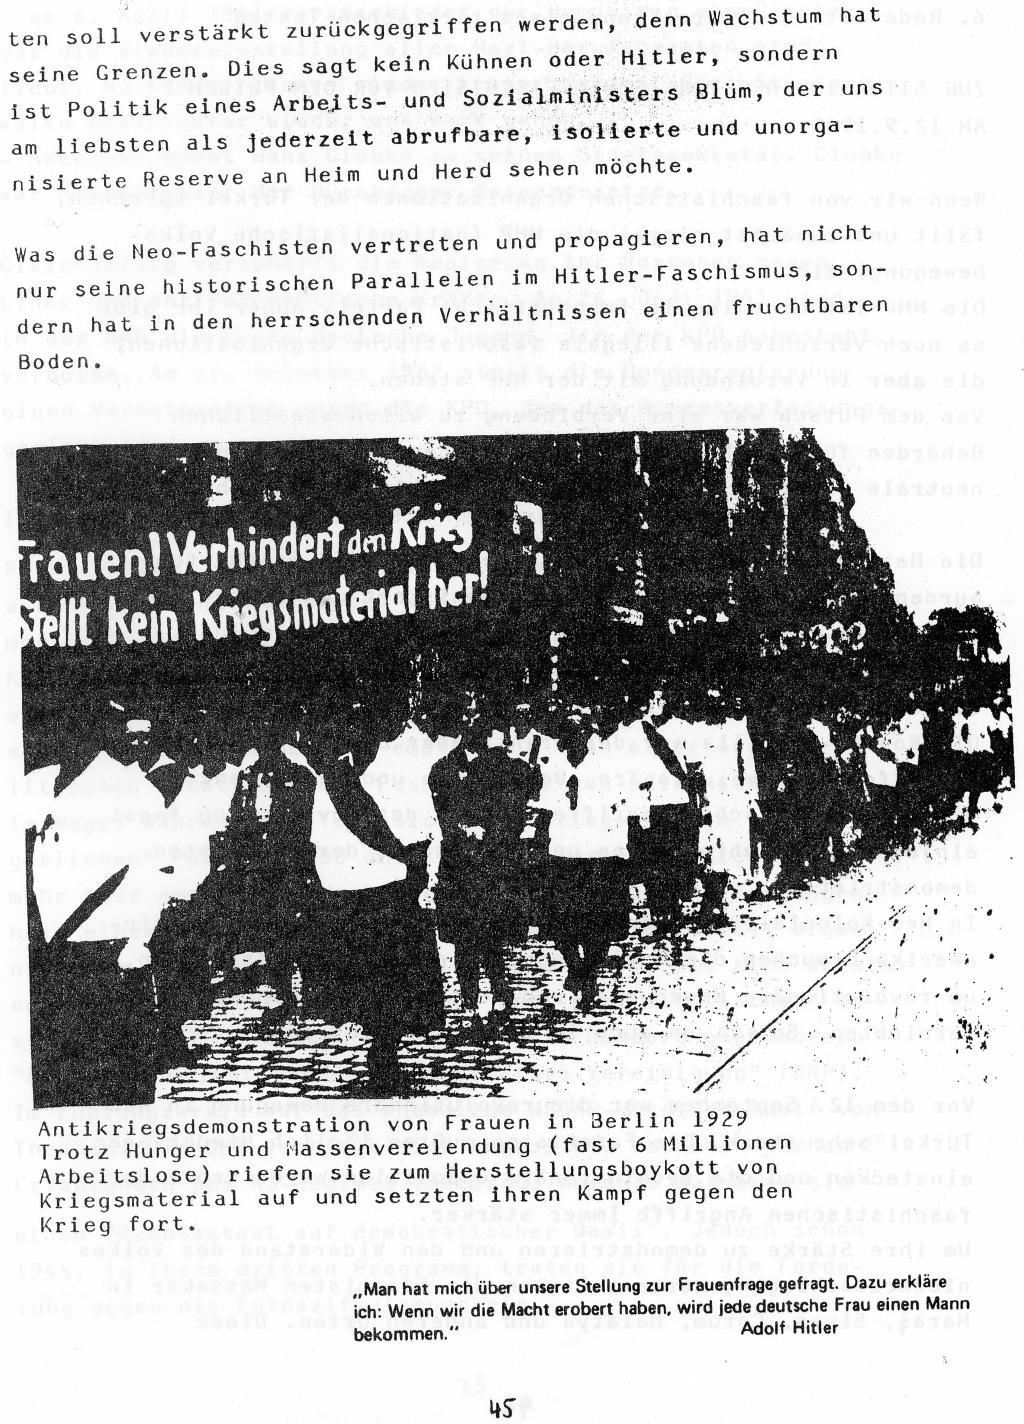 Berlin_1983_Autonome_Gruppen_Faschismus_im_Kapitalismus_45